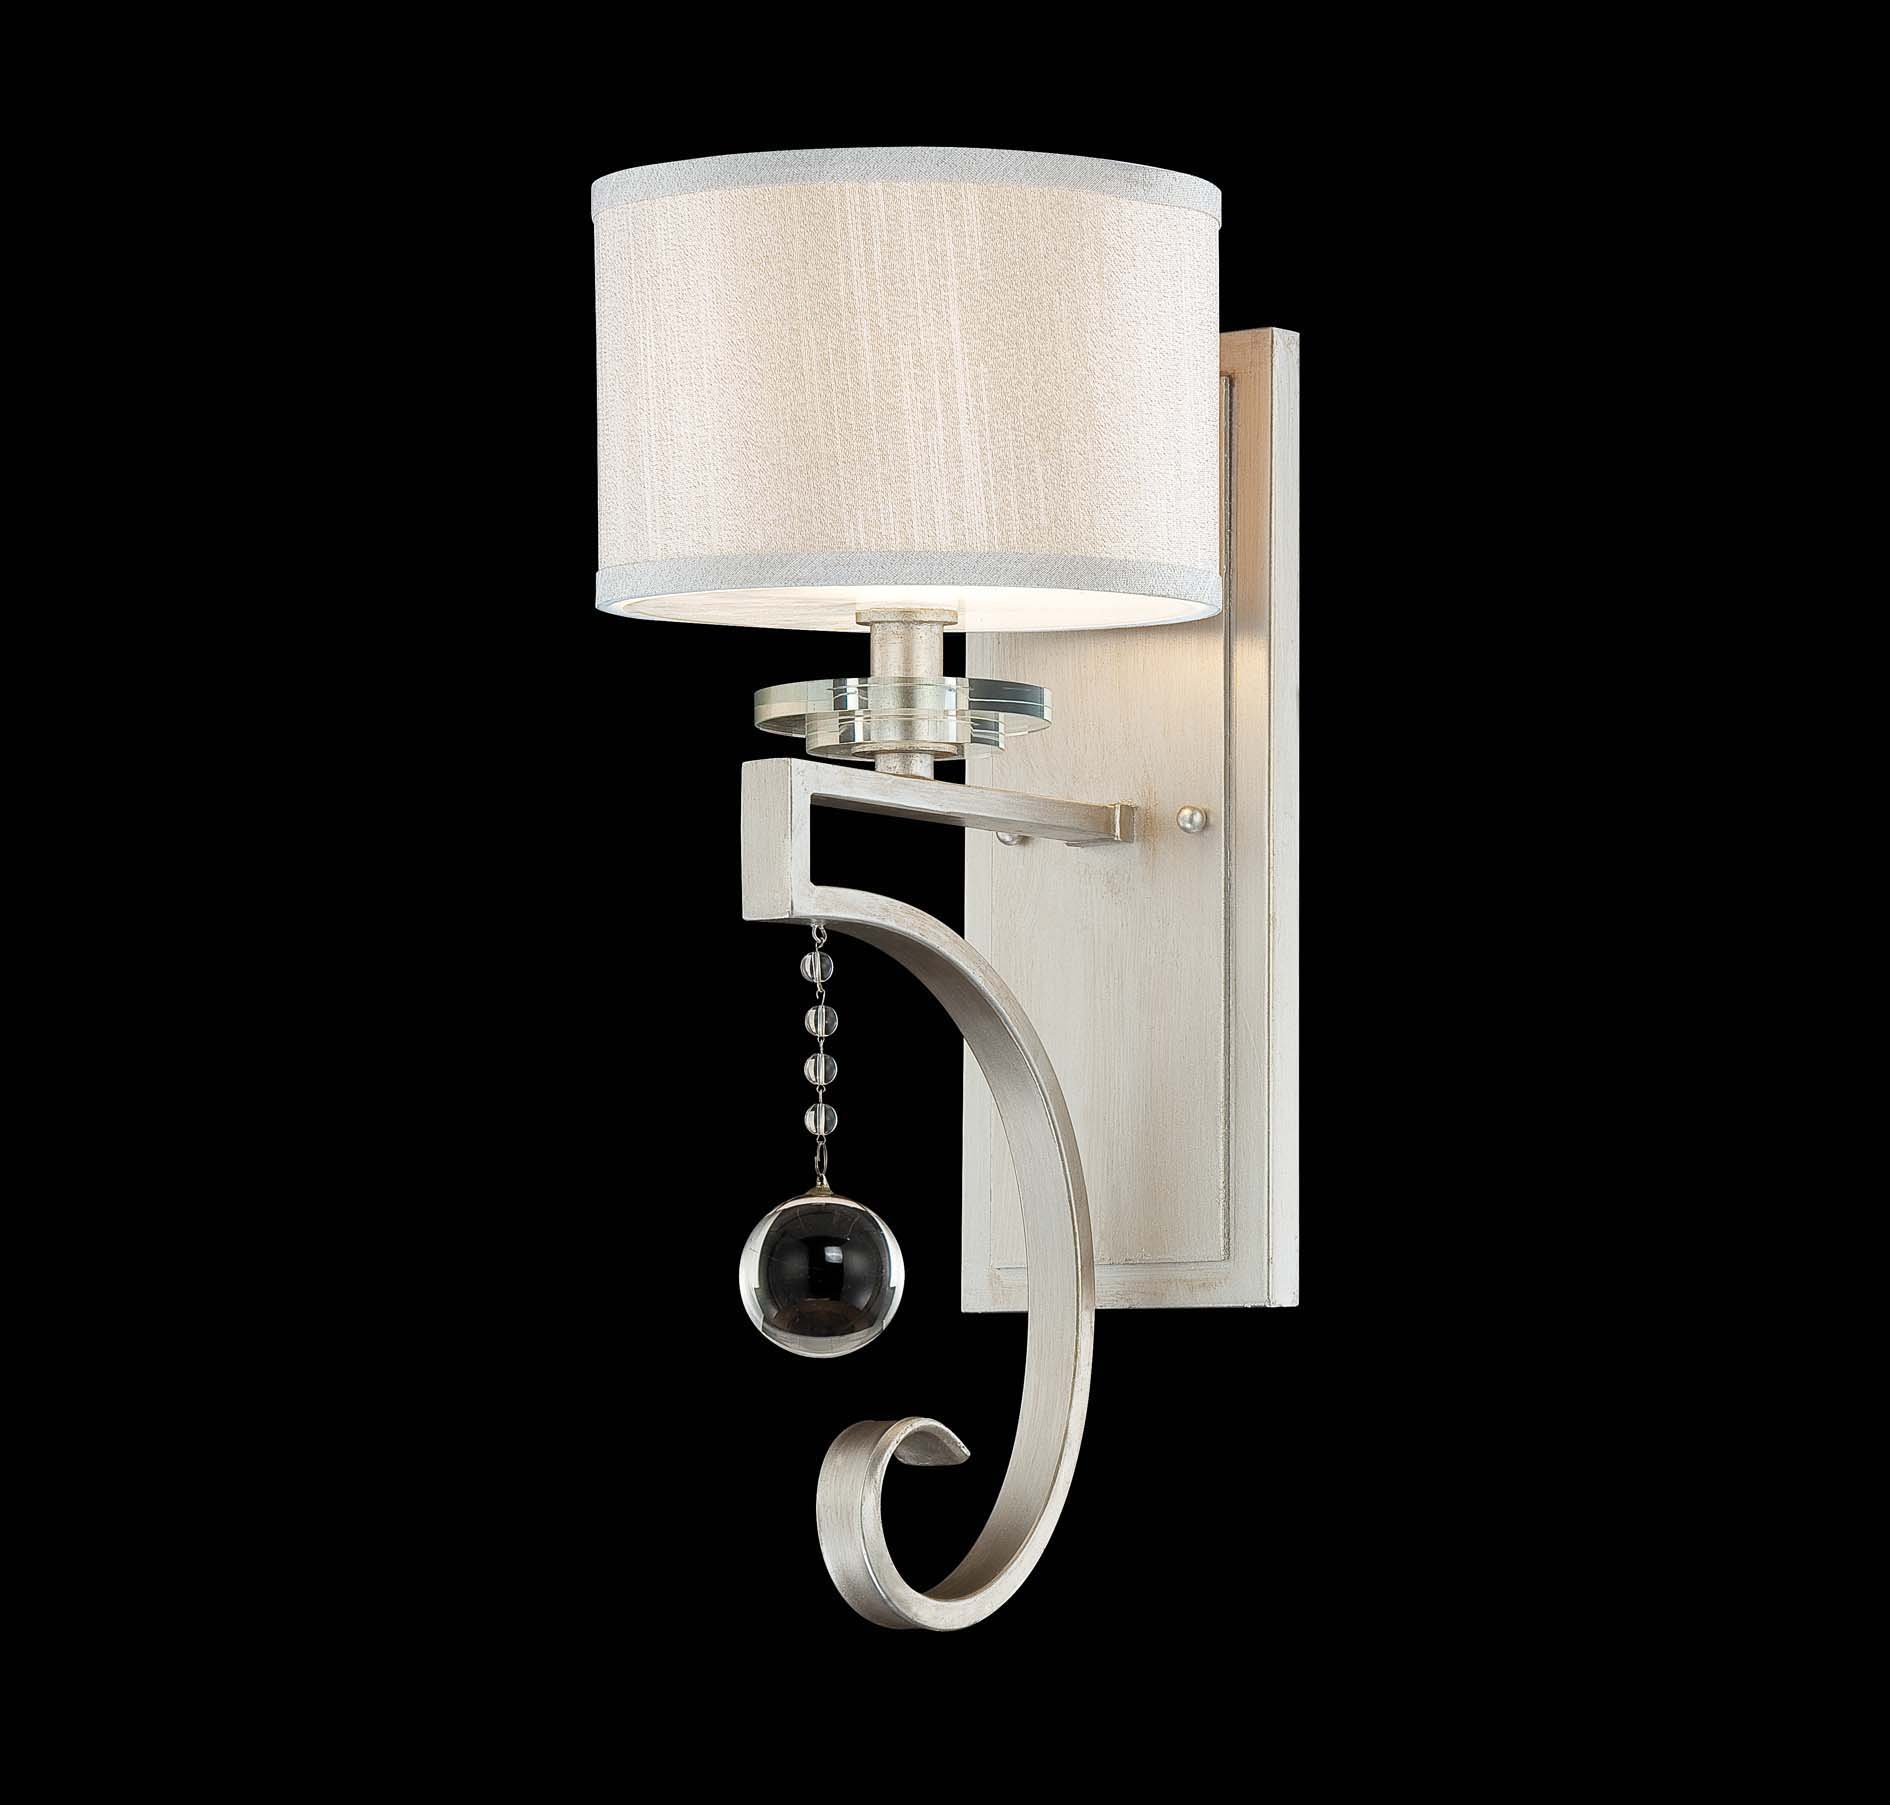 Savoy House 9-256-1-307, Rosendal 1-Light Sconce, Silver Sparkle